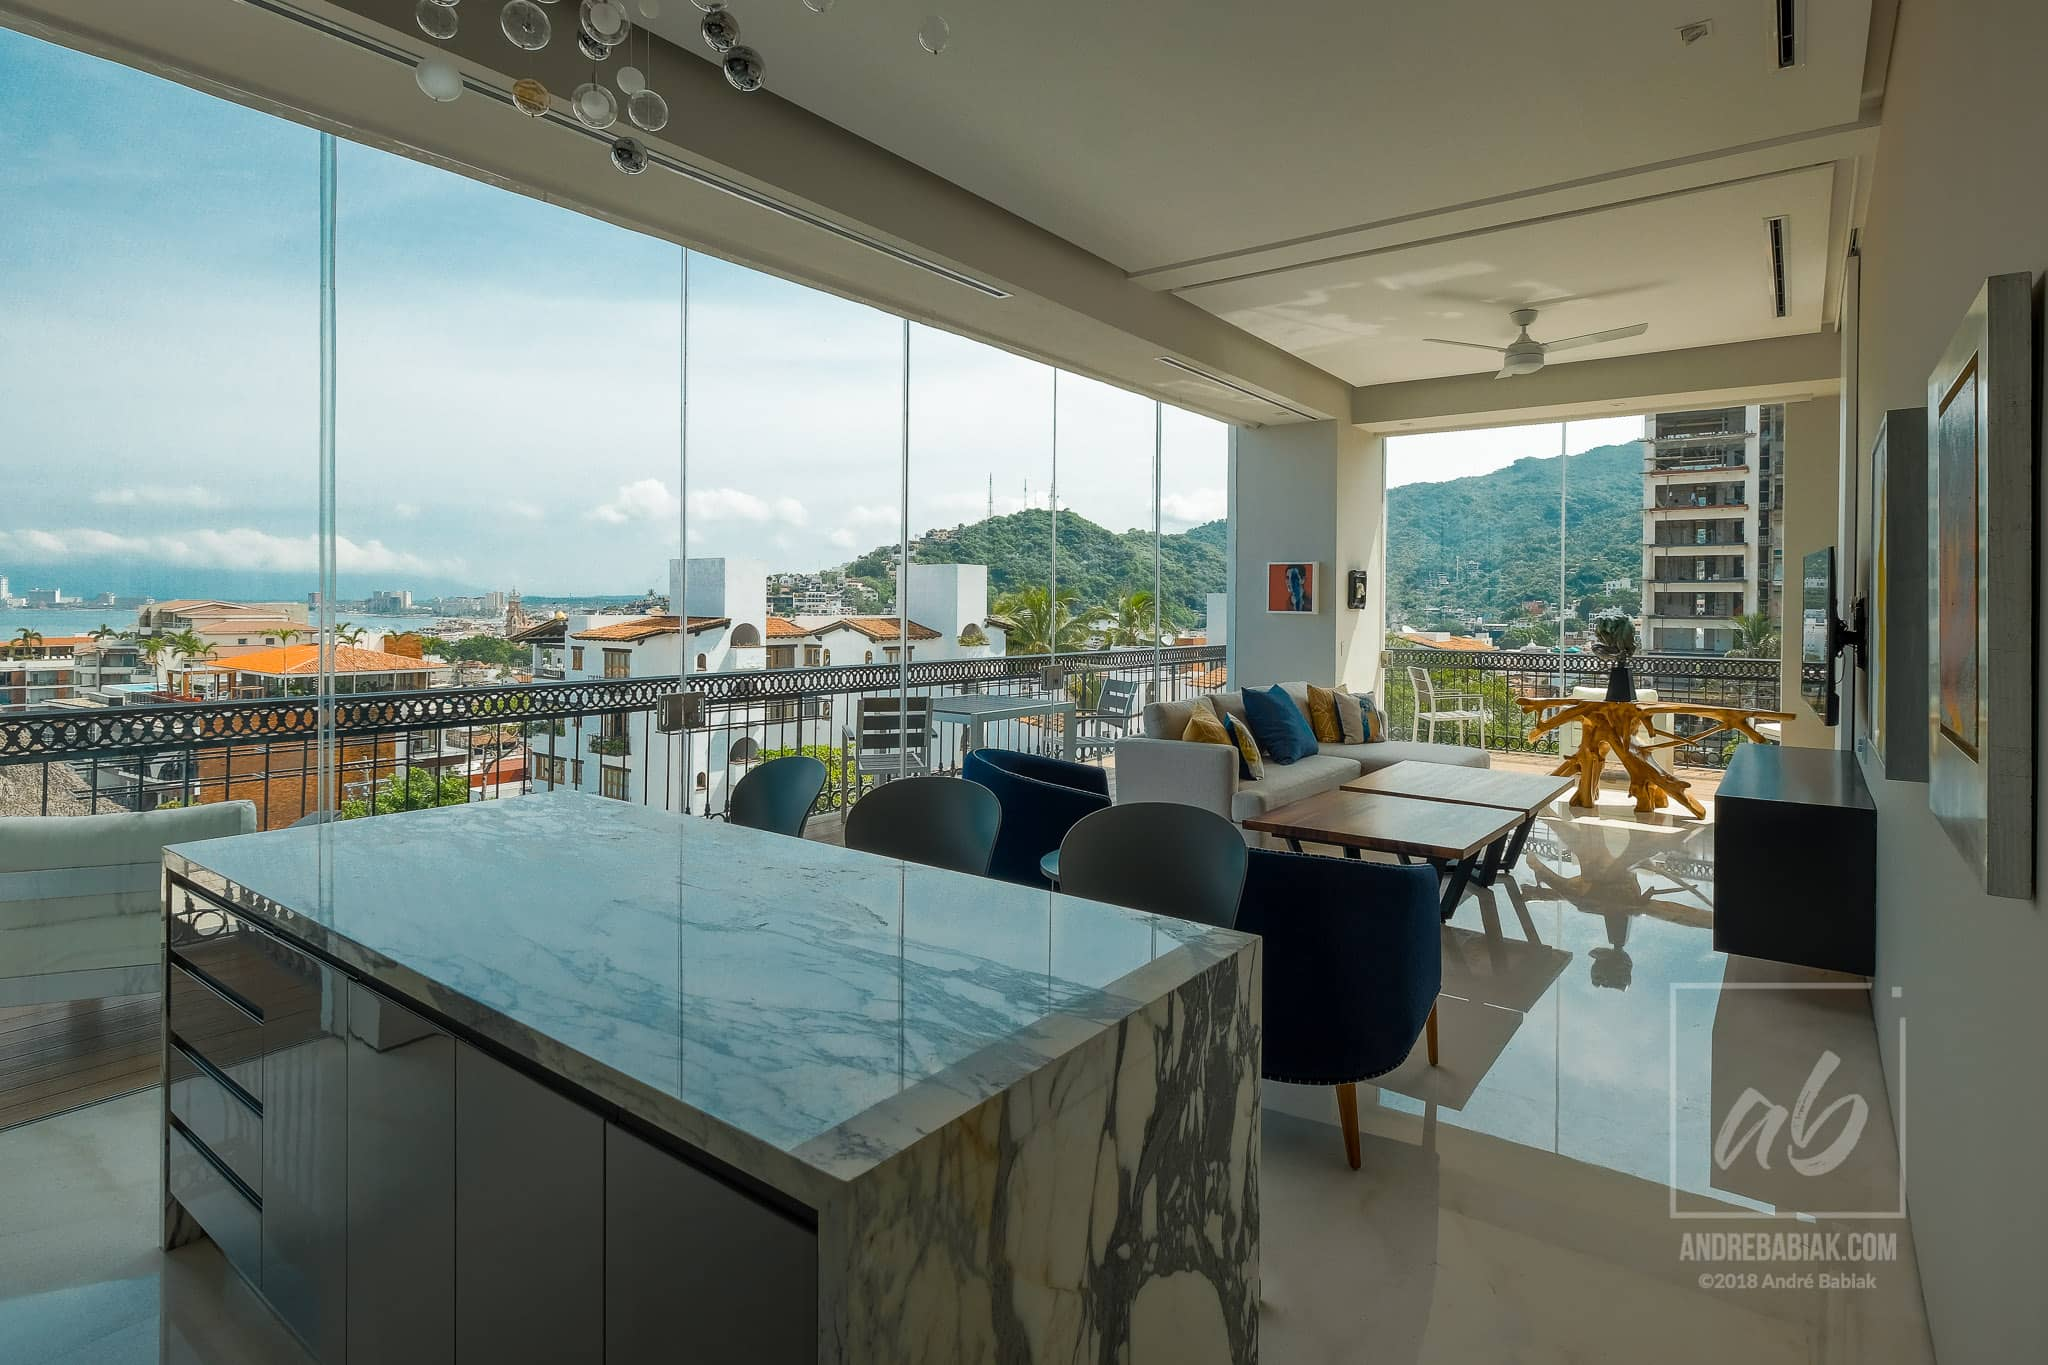 Architecture And Real Estate Photographer Puerto Vallarta 22